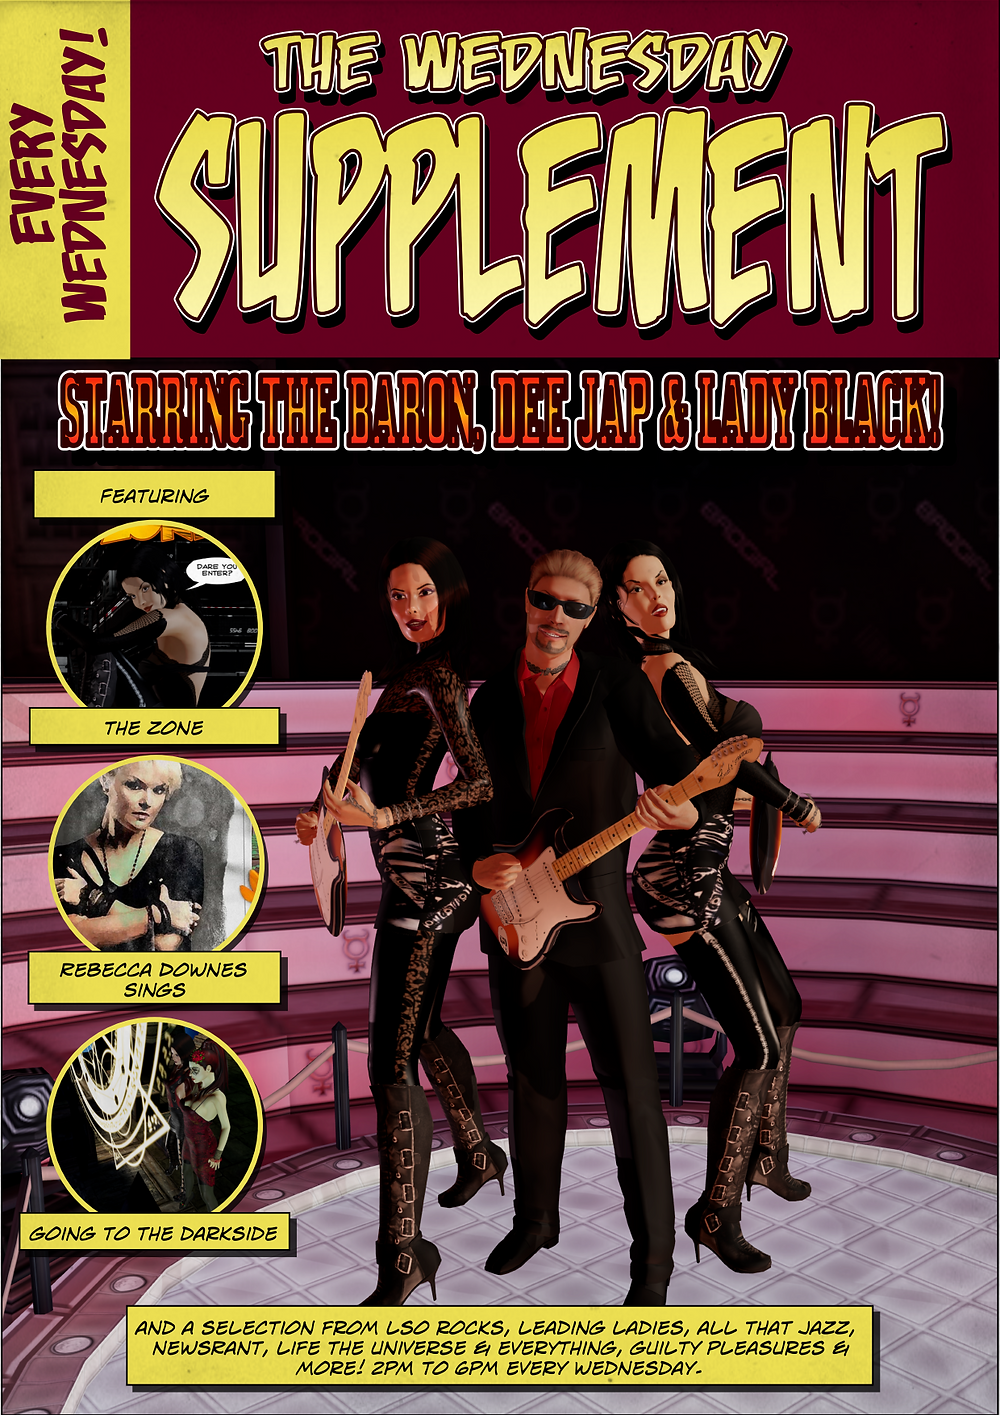 The Wednesday Supplement promo on revolutionradio.online